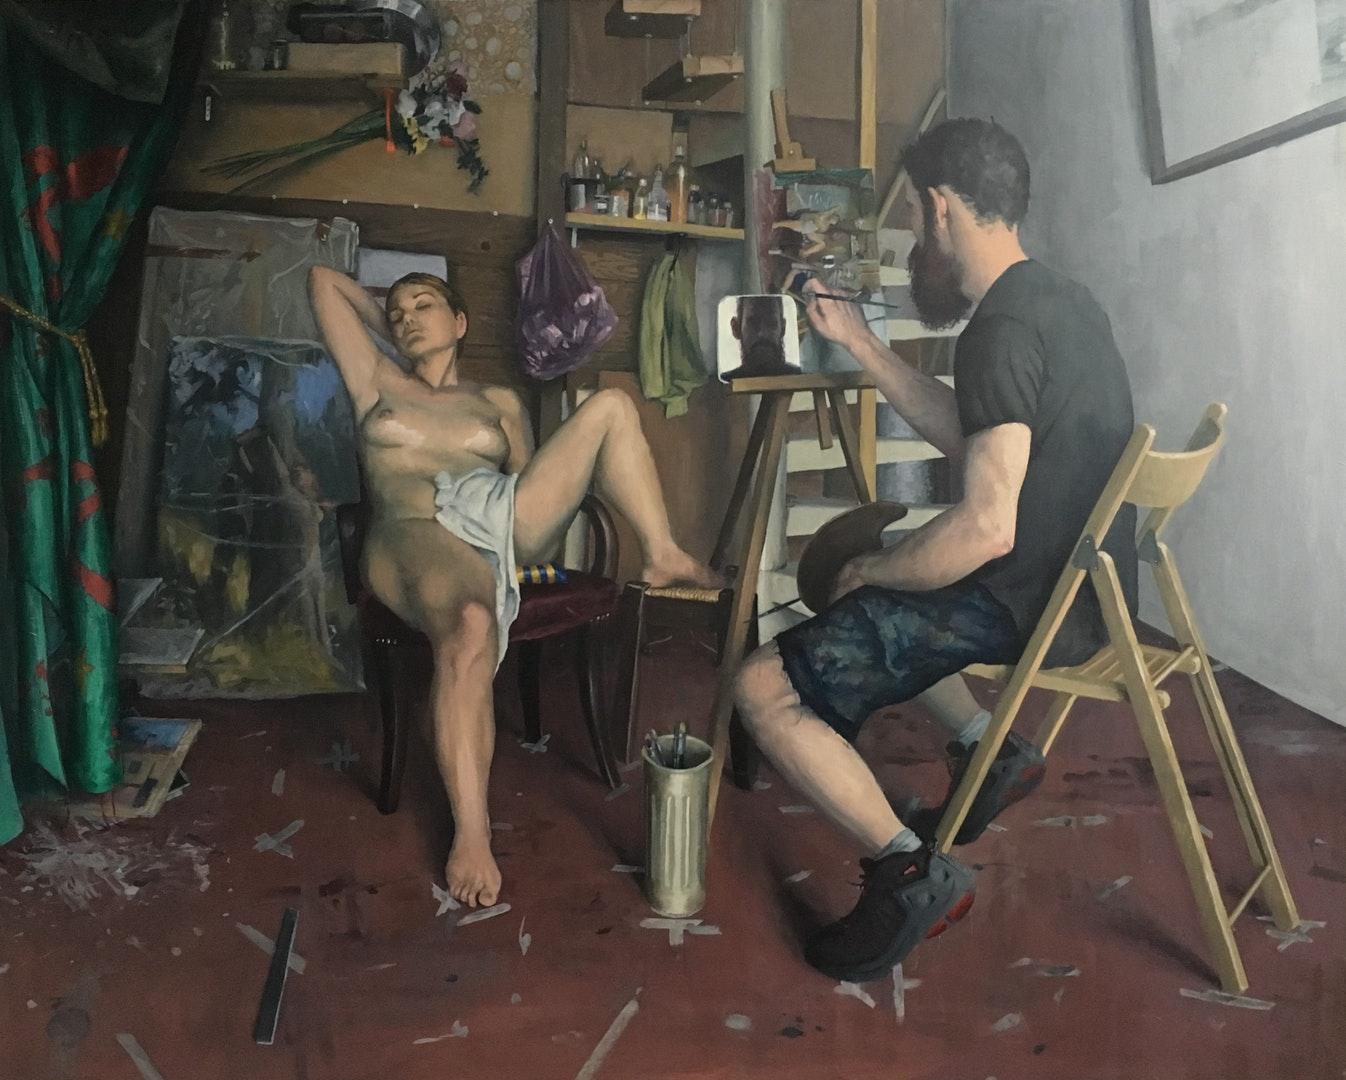 Sam Rahamin  Venus comes to visit my studio  Oil on wood, 113 x 133 x 7 cm  http://www.samrachamin.com